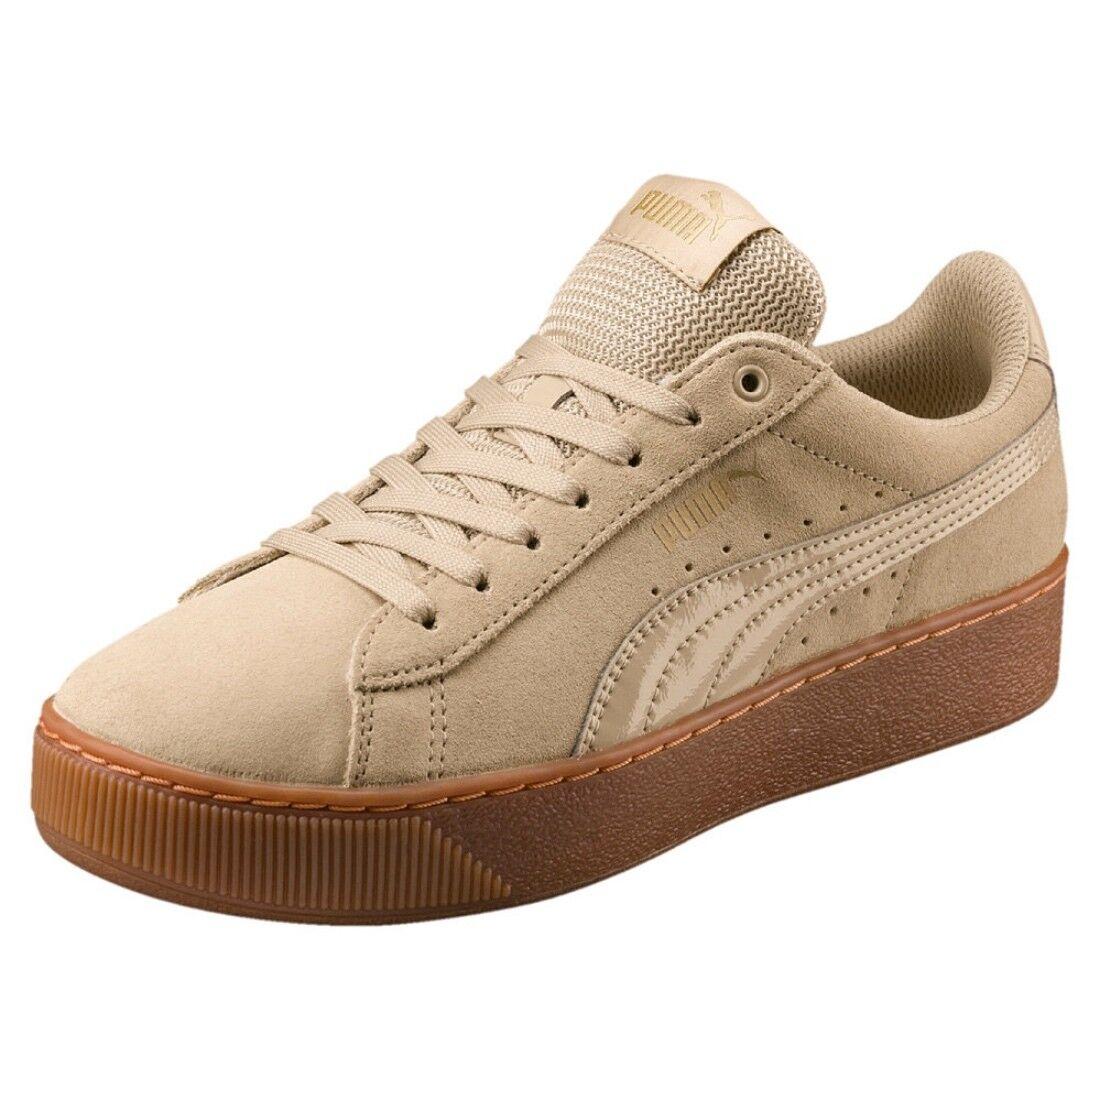 Puma Vikky Platform Basket Femmes Chaussures 363287 Pebble UK 3.5 - EUR 36